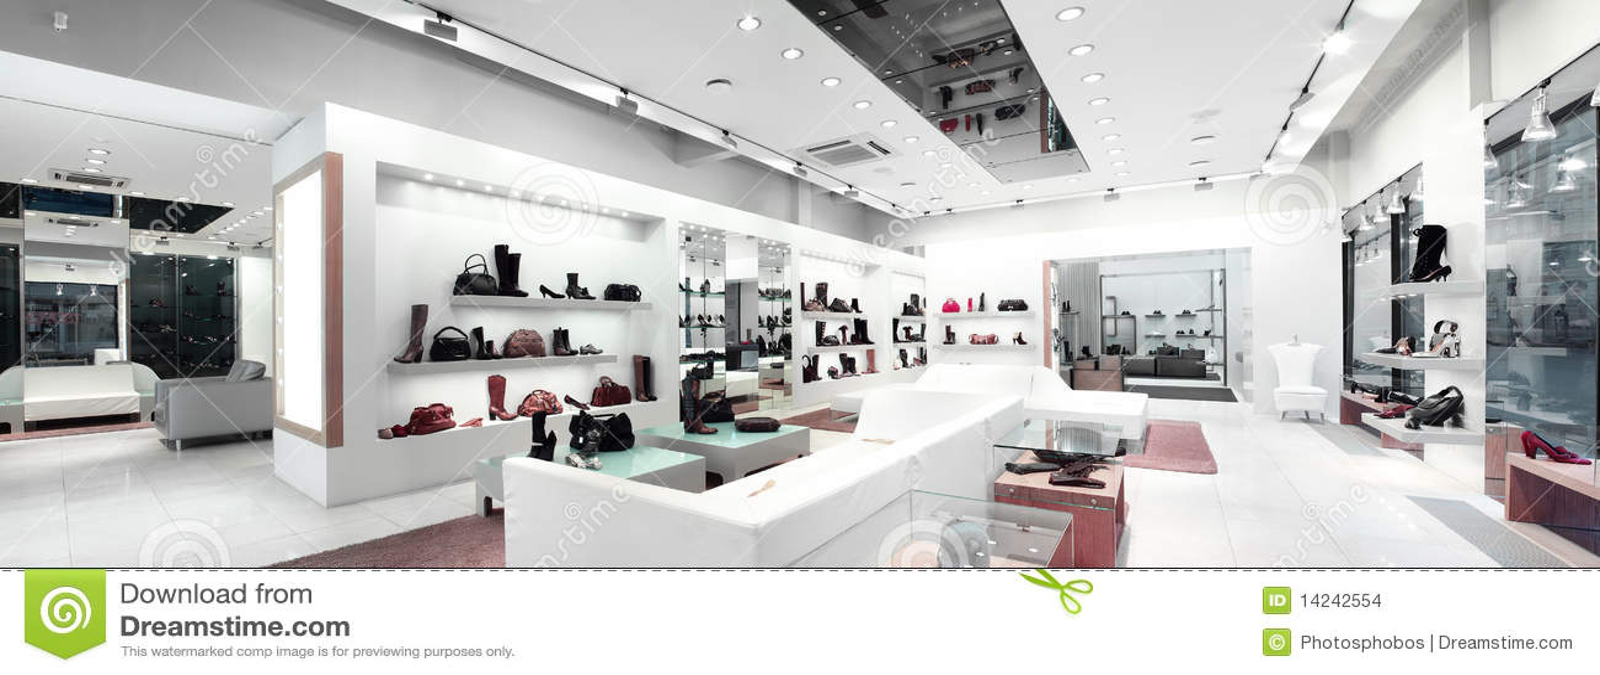 Interioren shoppar